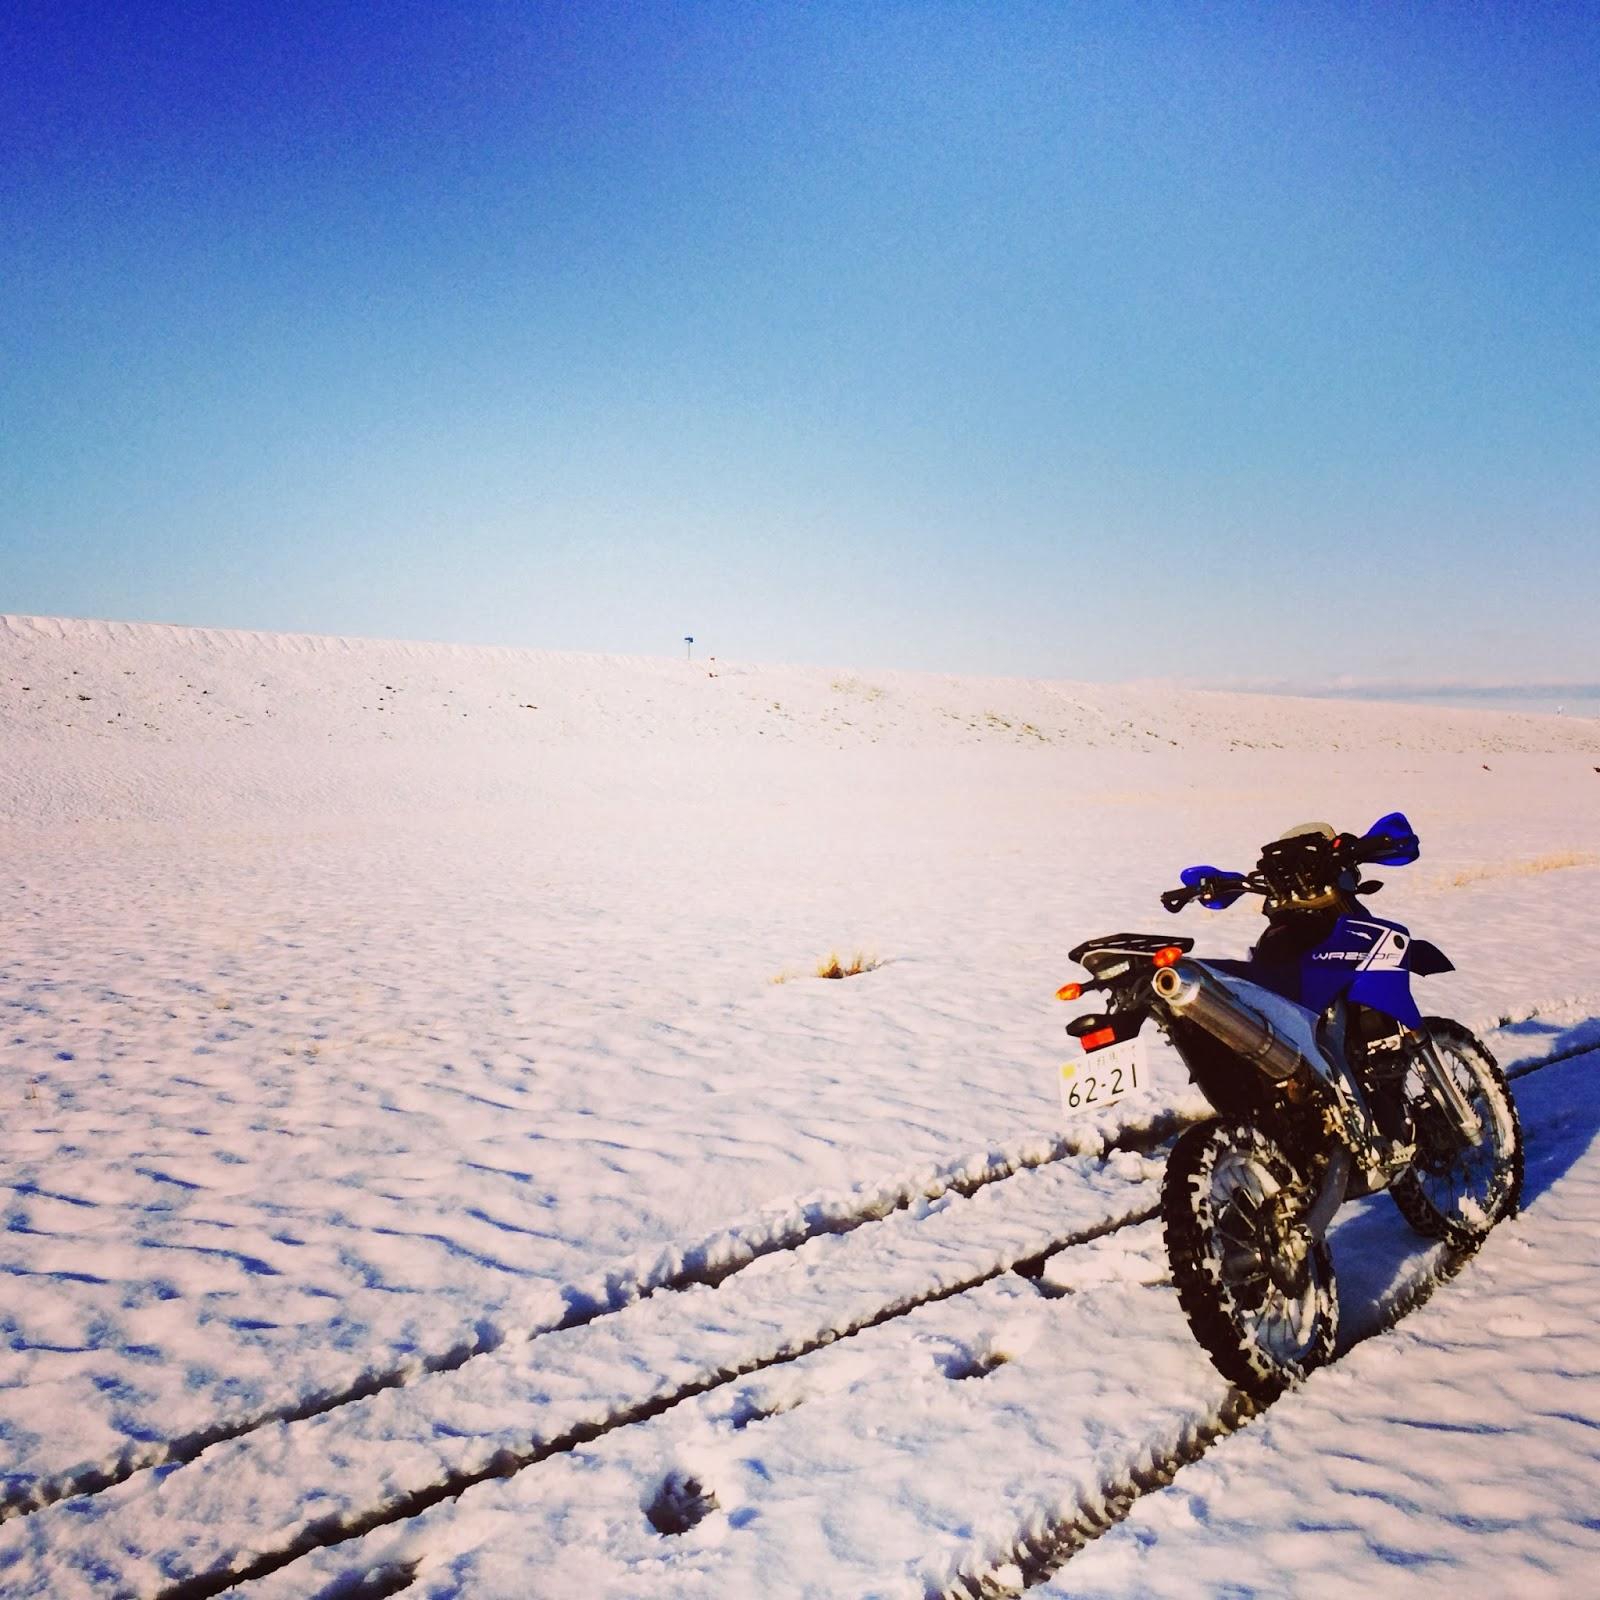 WR250R snow ride